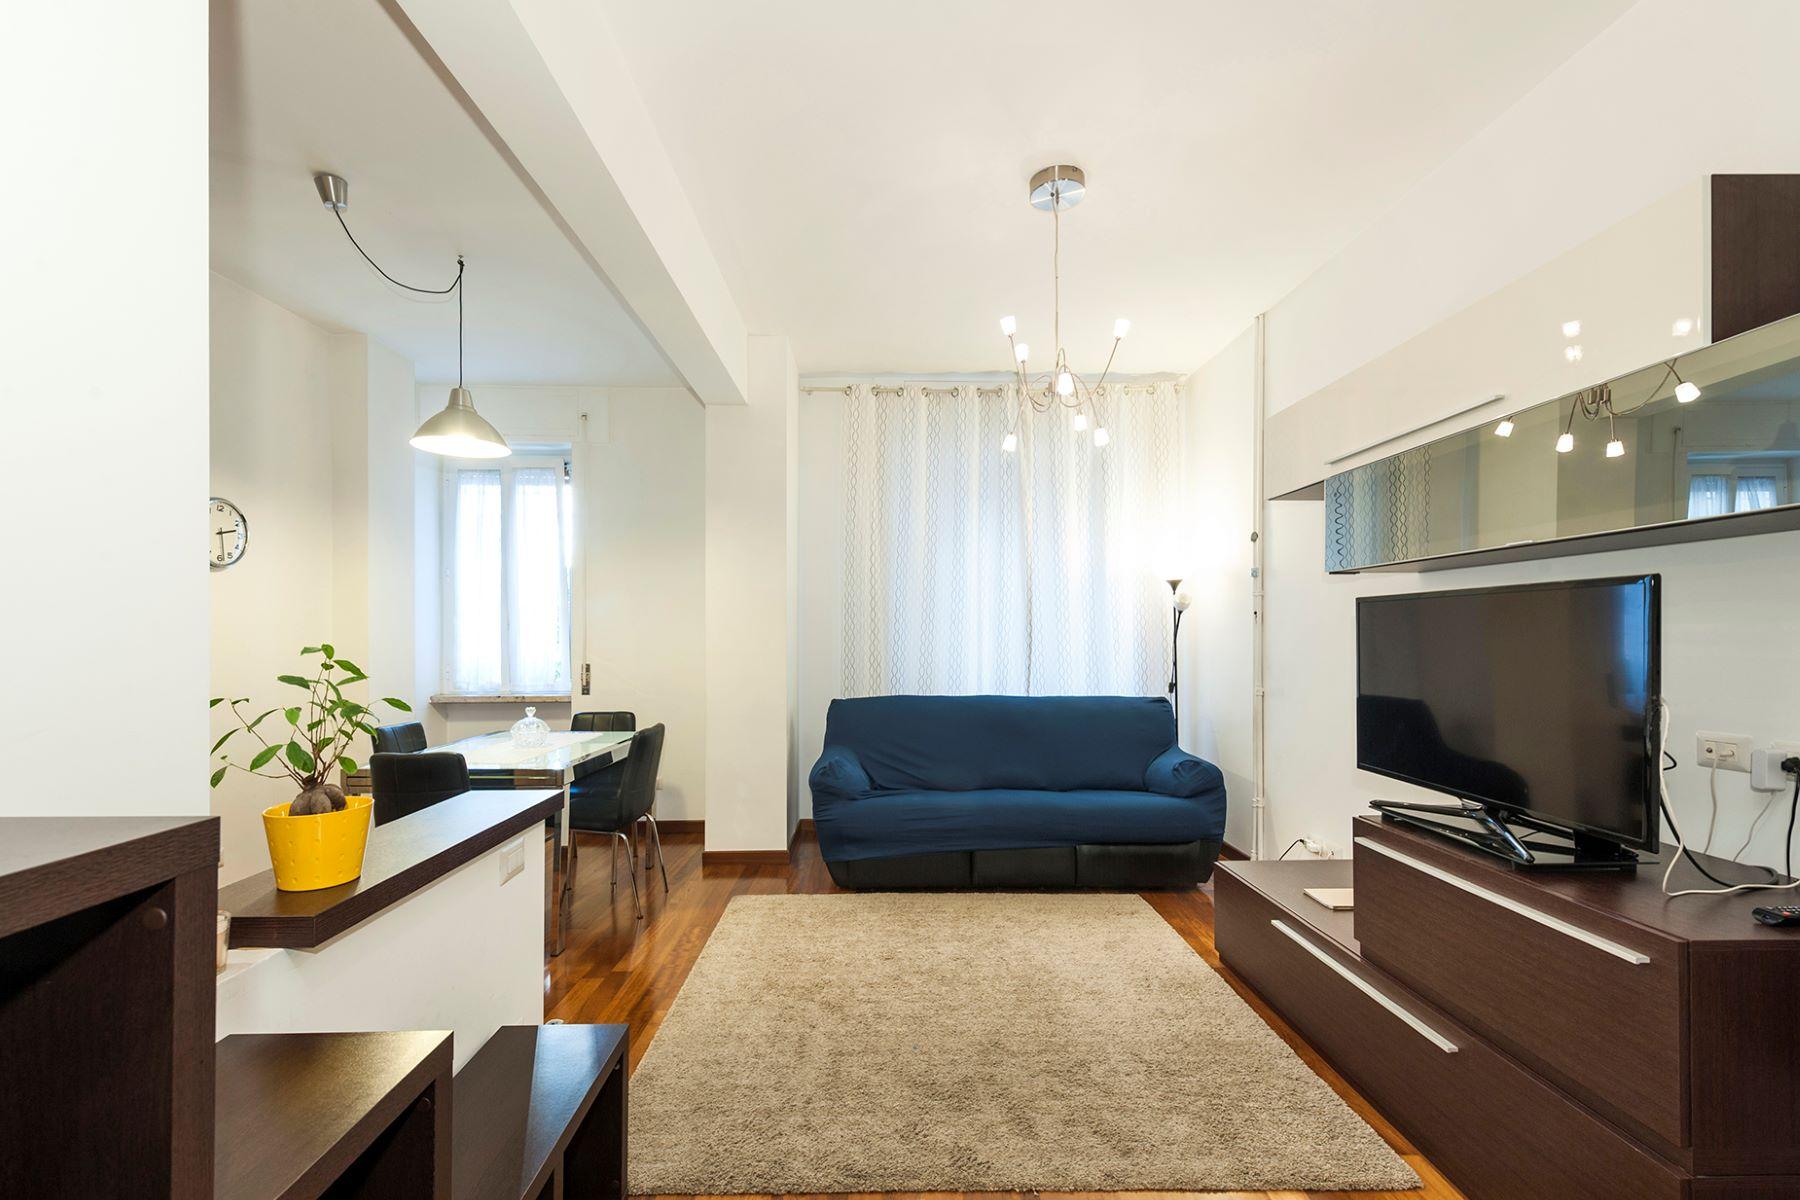 Appartement pour l Vente à Renovated apartment in the Prati neighborhood Via Costabella Rome, Rome 00195 Italie